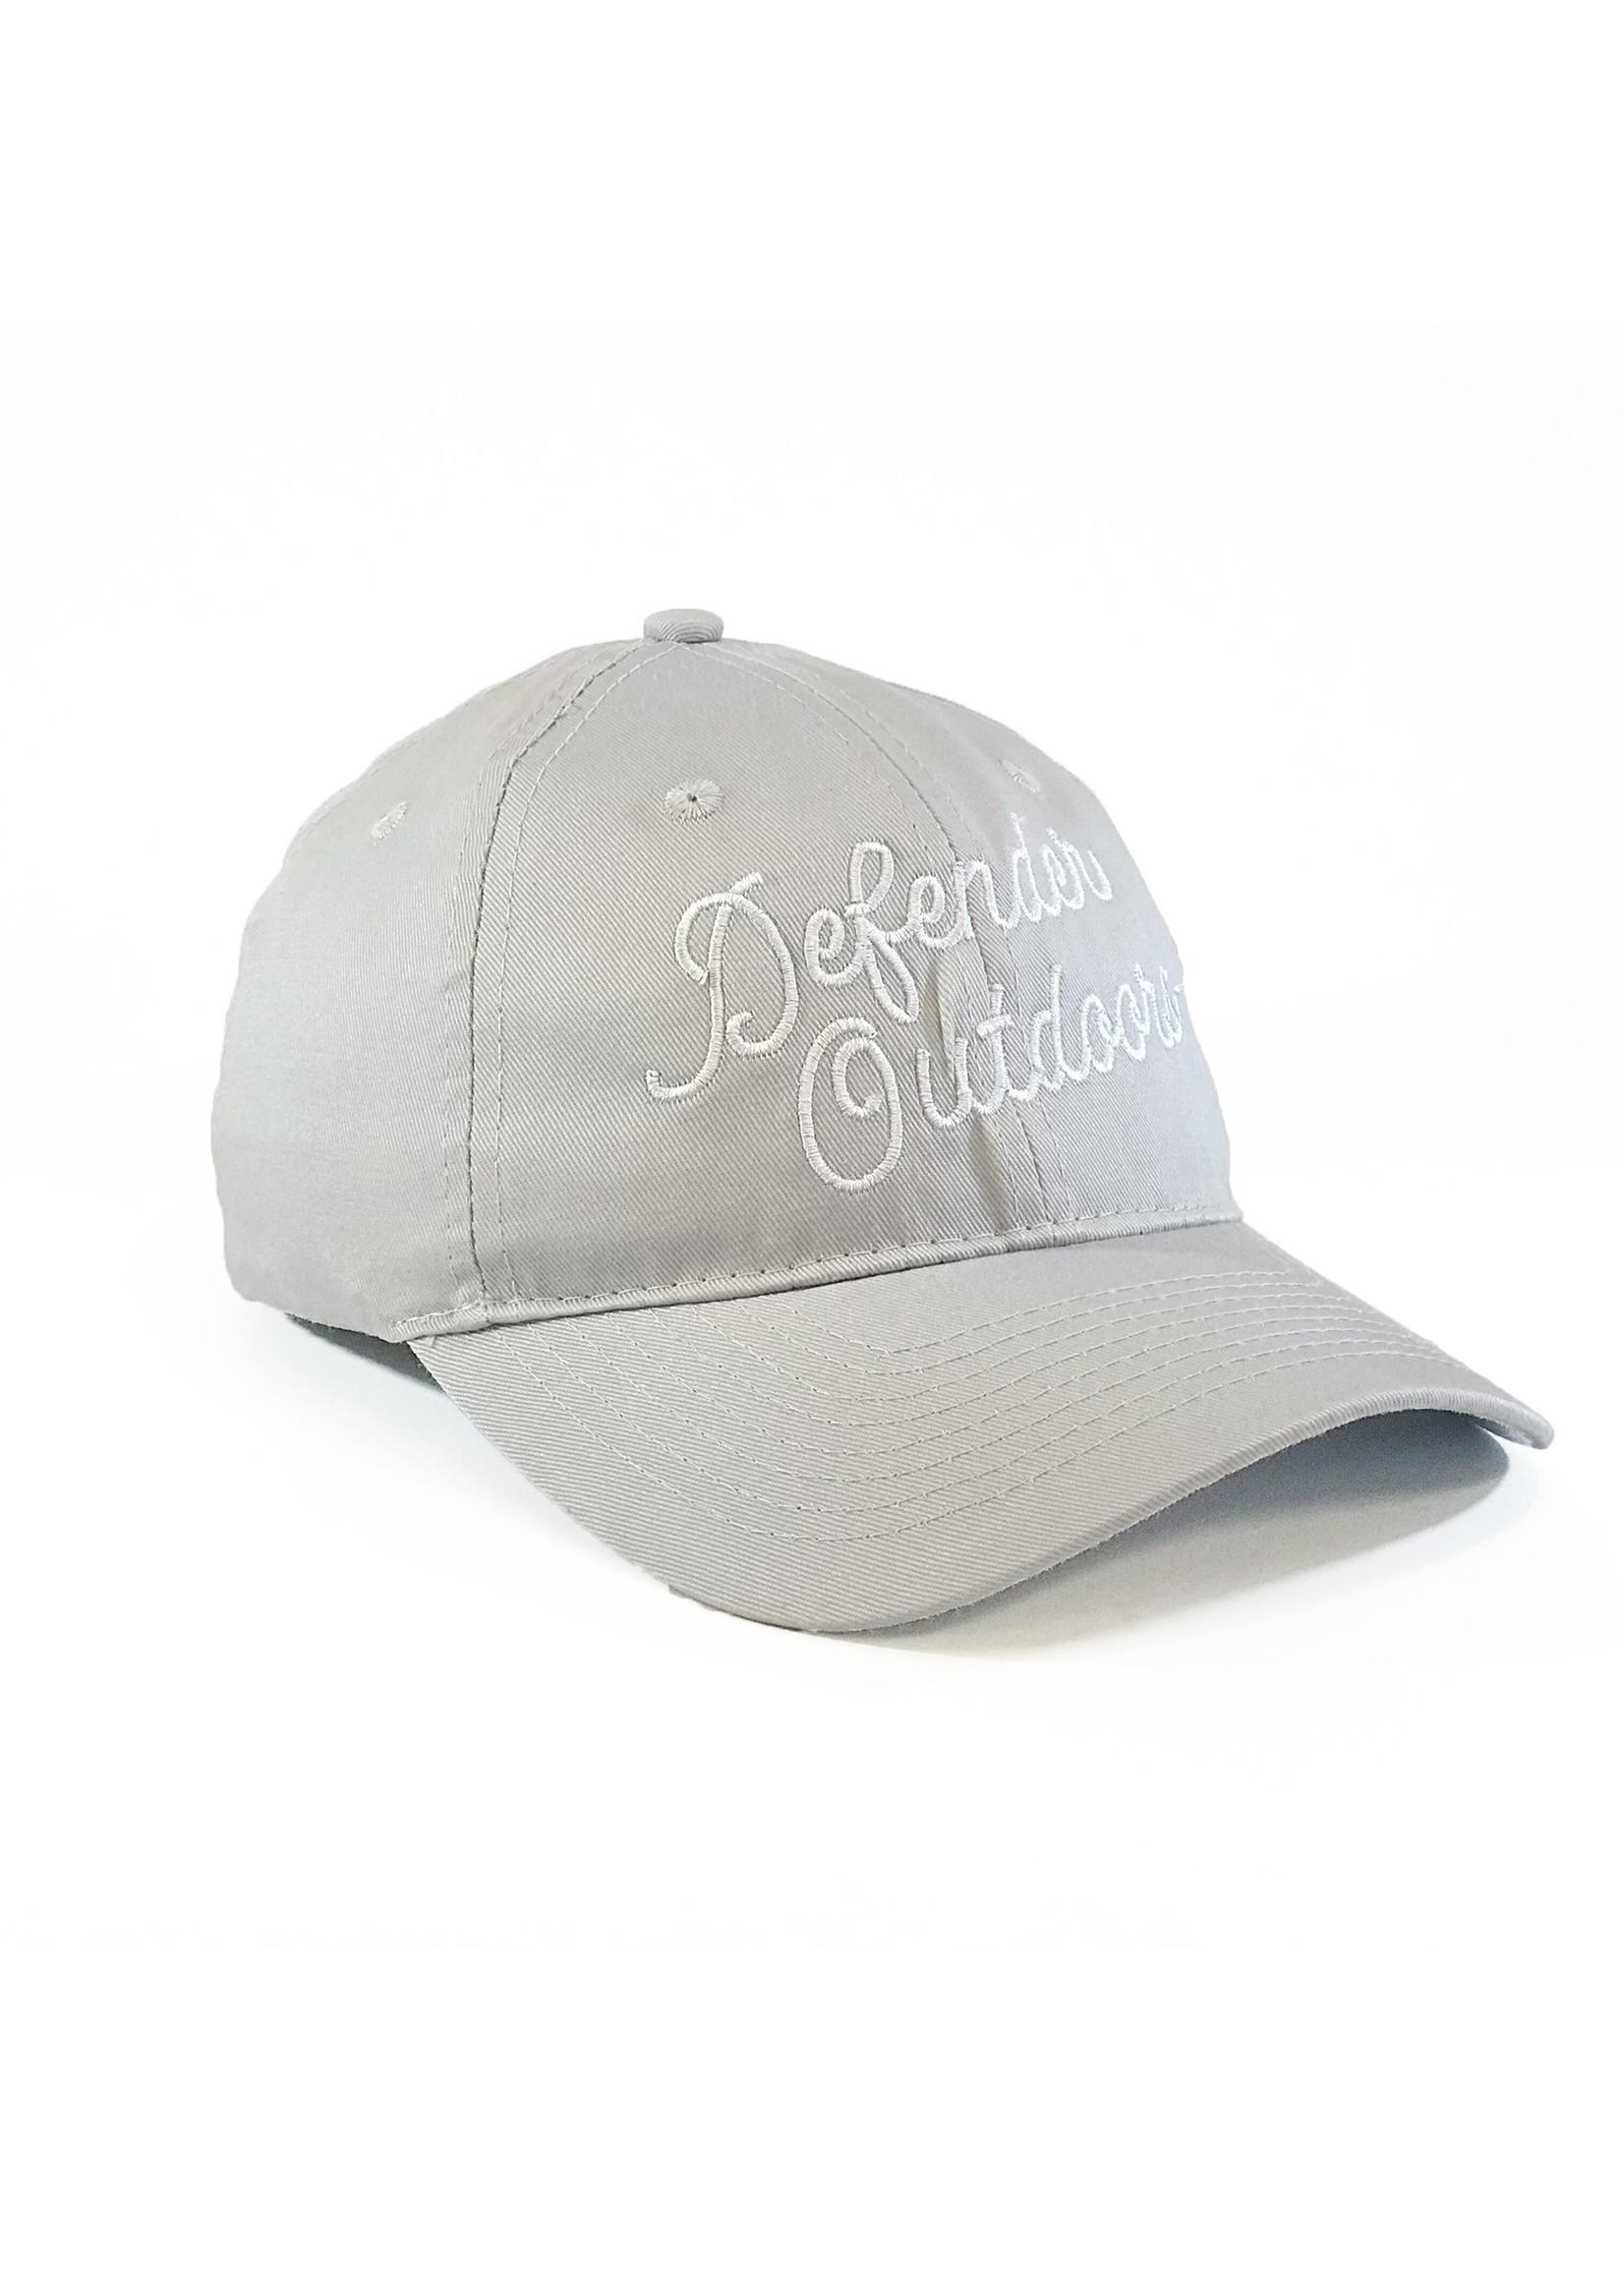 Defender Outdoors Twill Script Hat